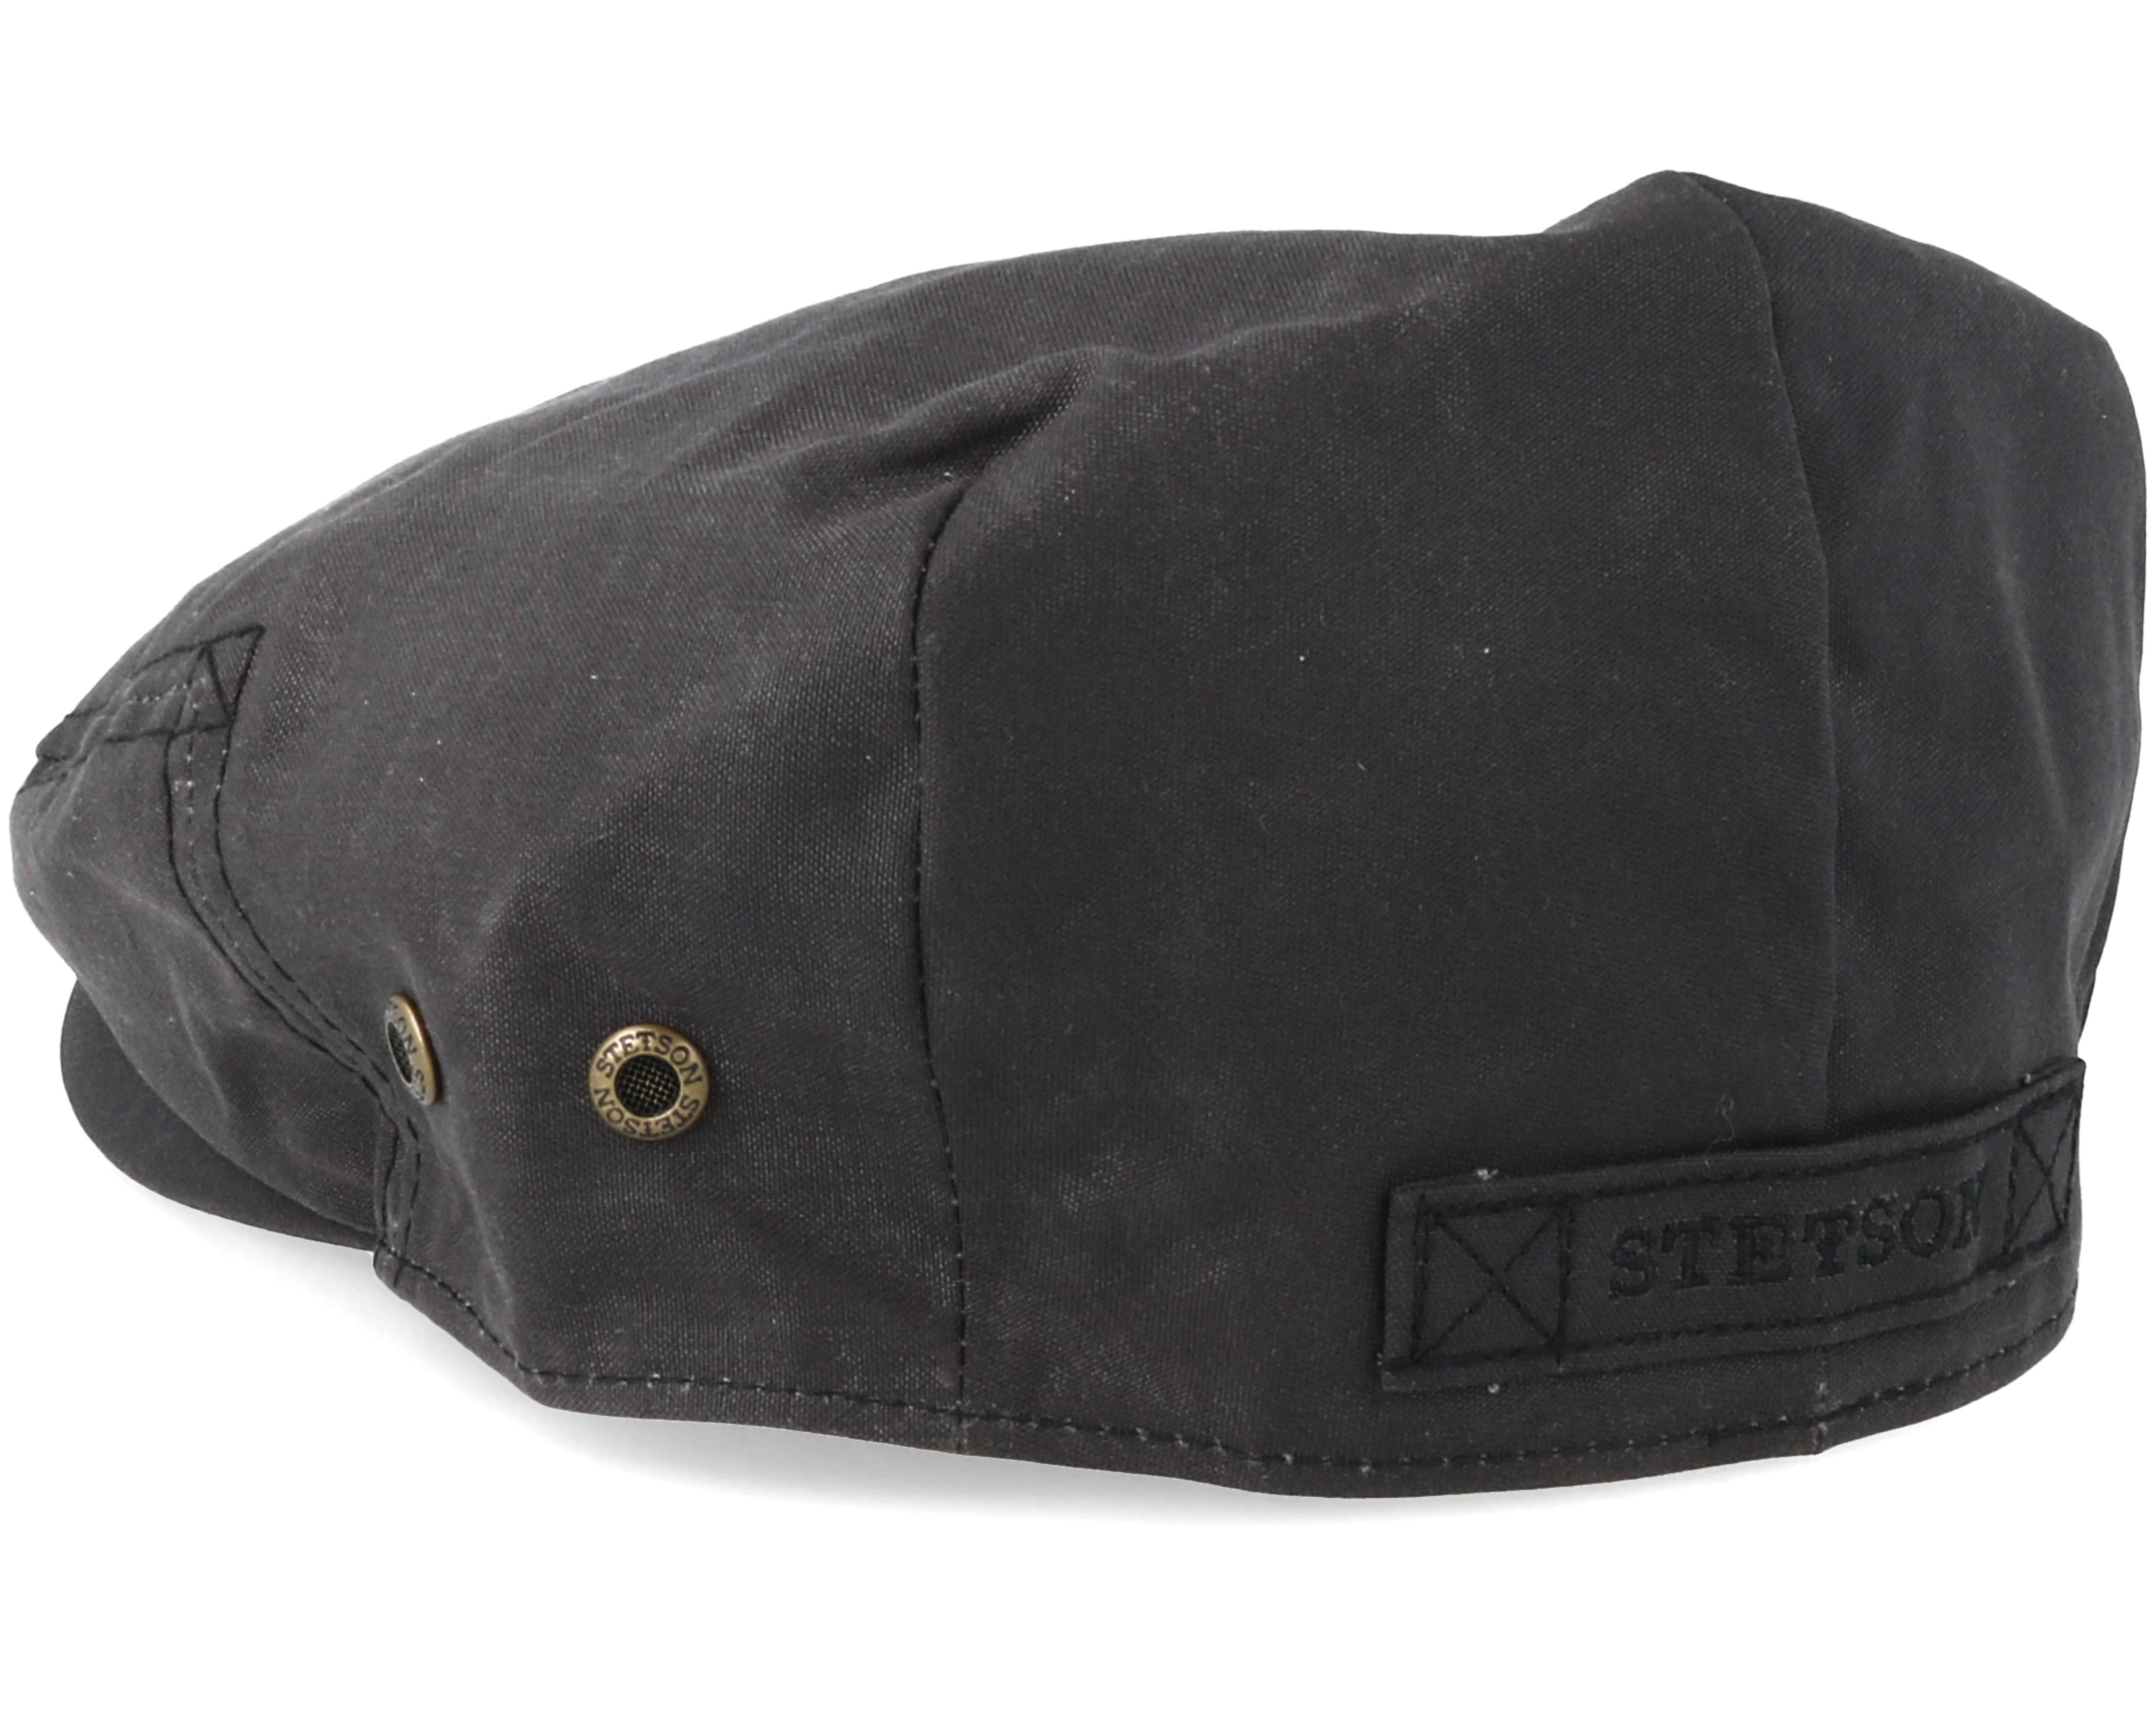 Driver Cap Waxed Cotton Black Flat Cap Stetson Caps